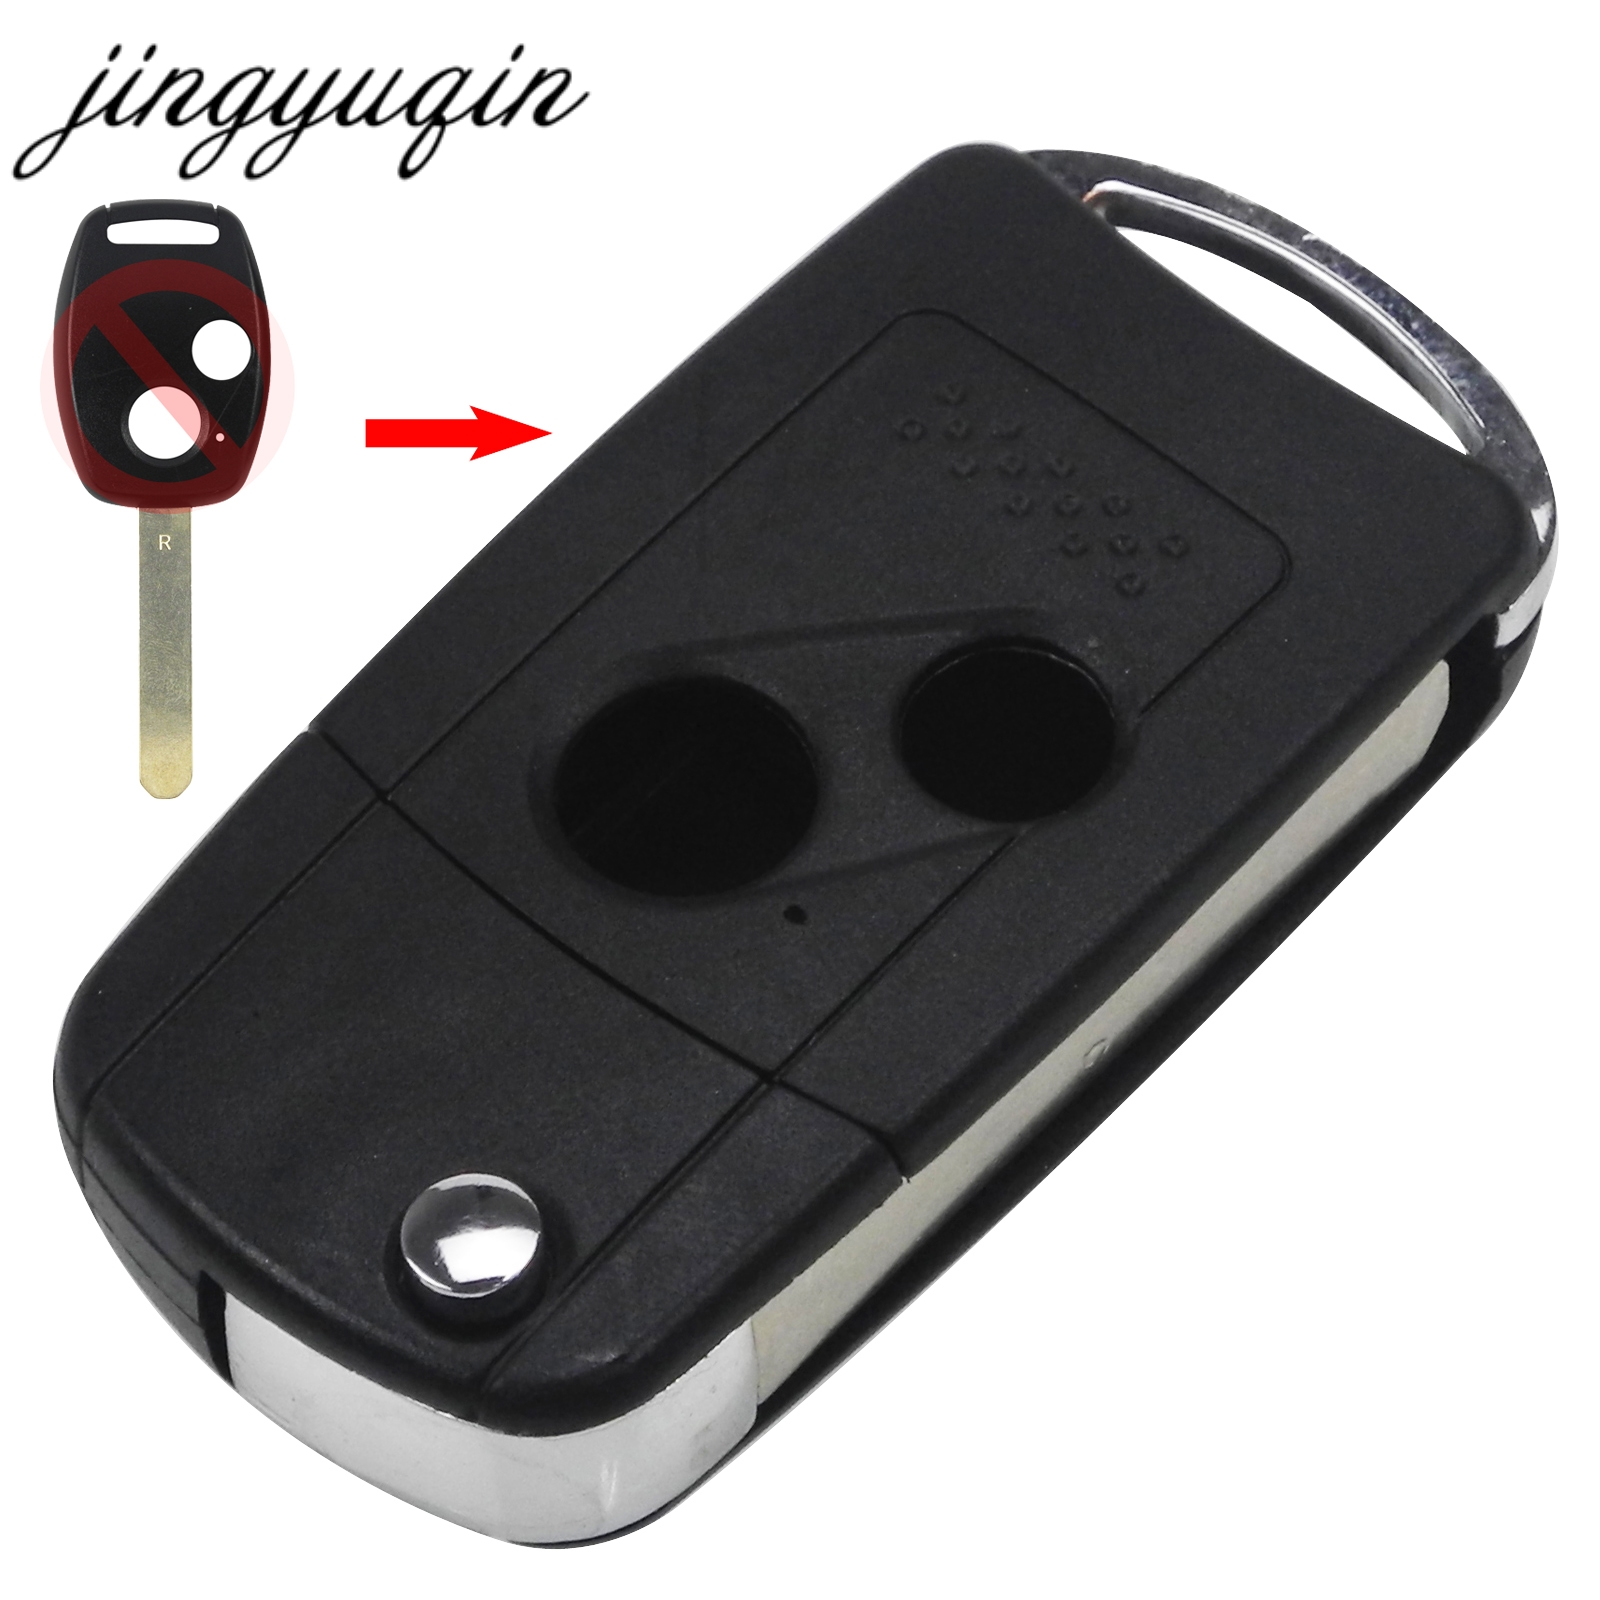 jingyuqin 10pcs lot Remote 2 Button Flip Folding Key Shell Case Cover For Honda CRV Accord